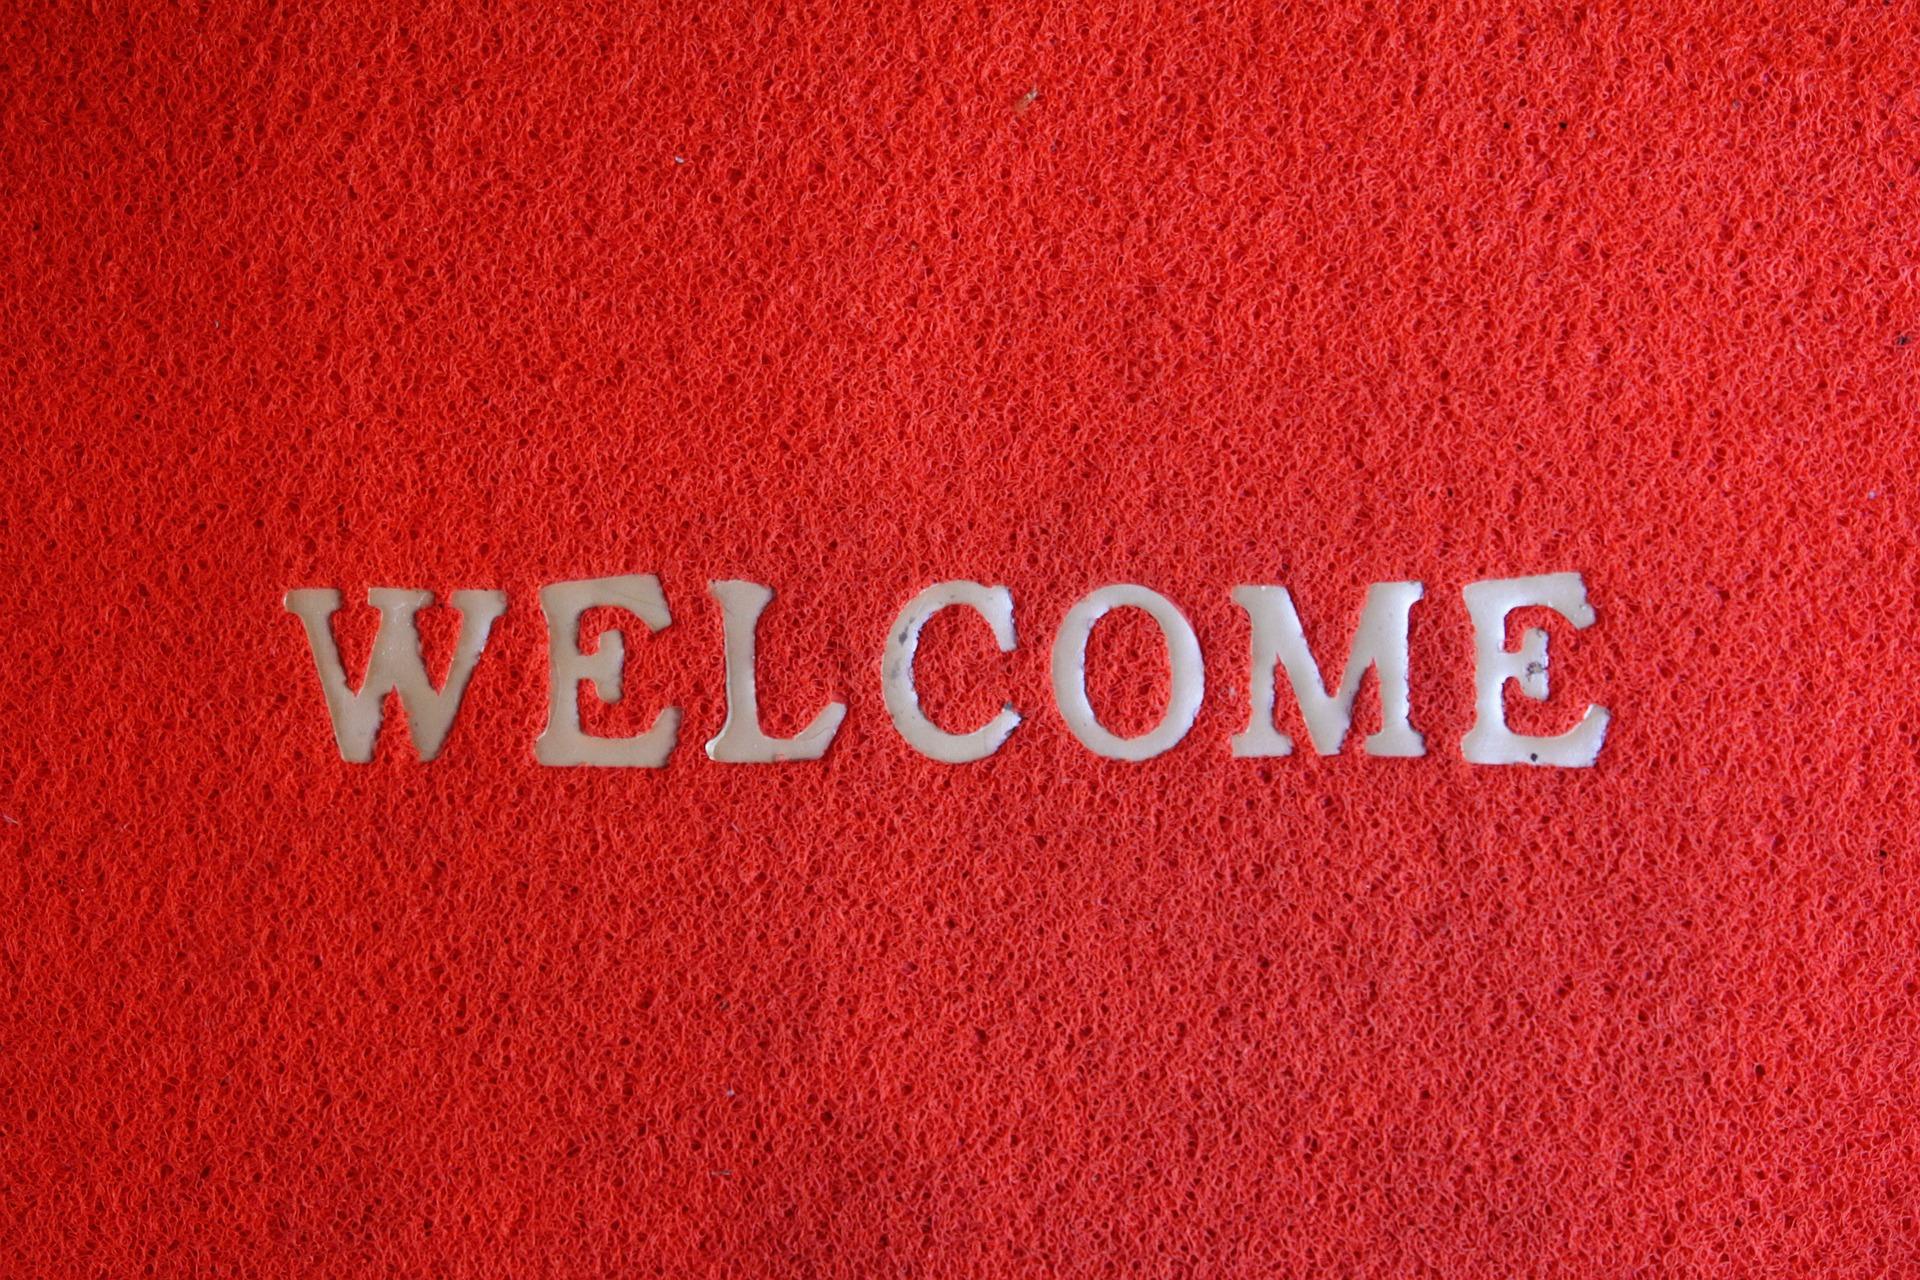 welcome-1607501_1920.jpg